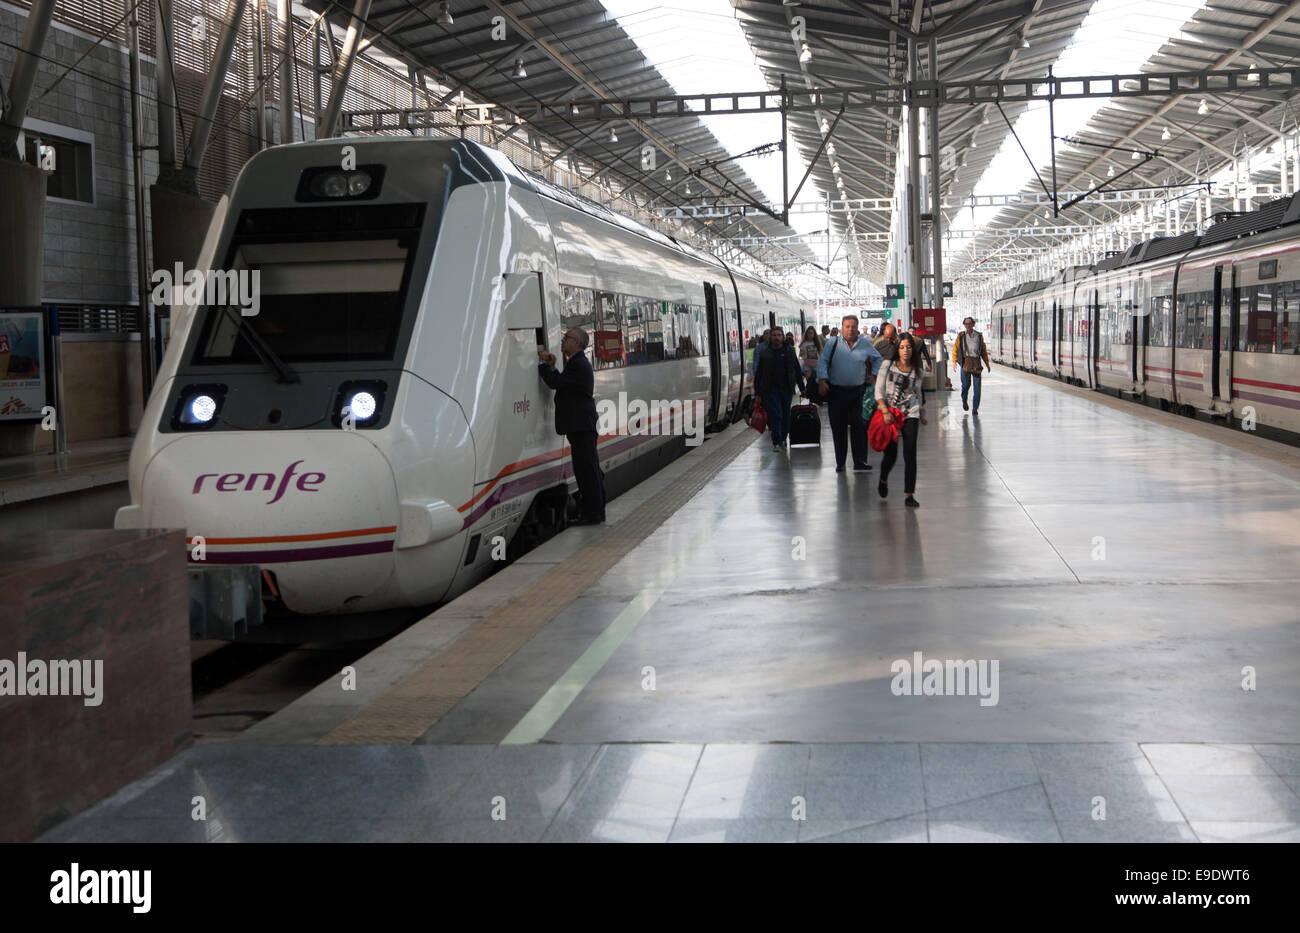 Train at platform inside María Zambrano railway station Malaga, Spain - Stock Image